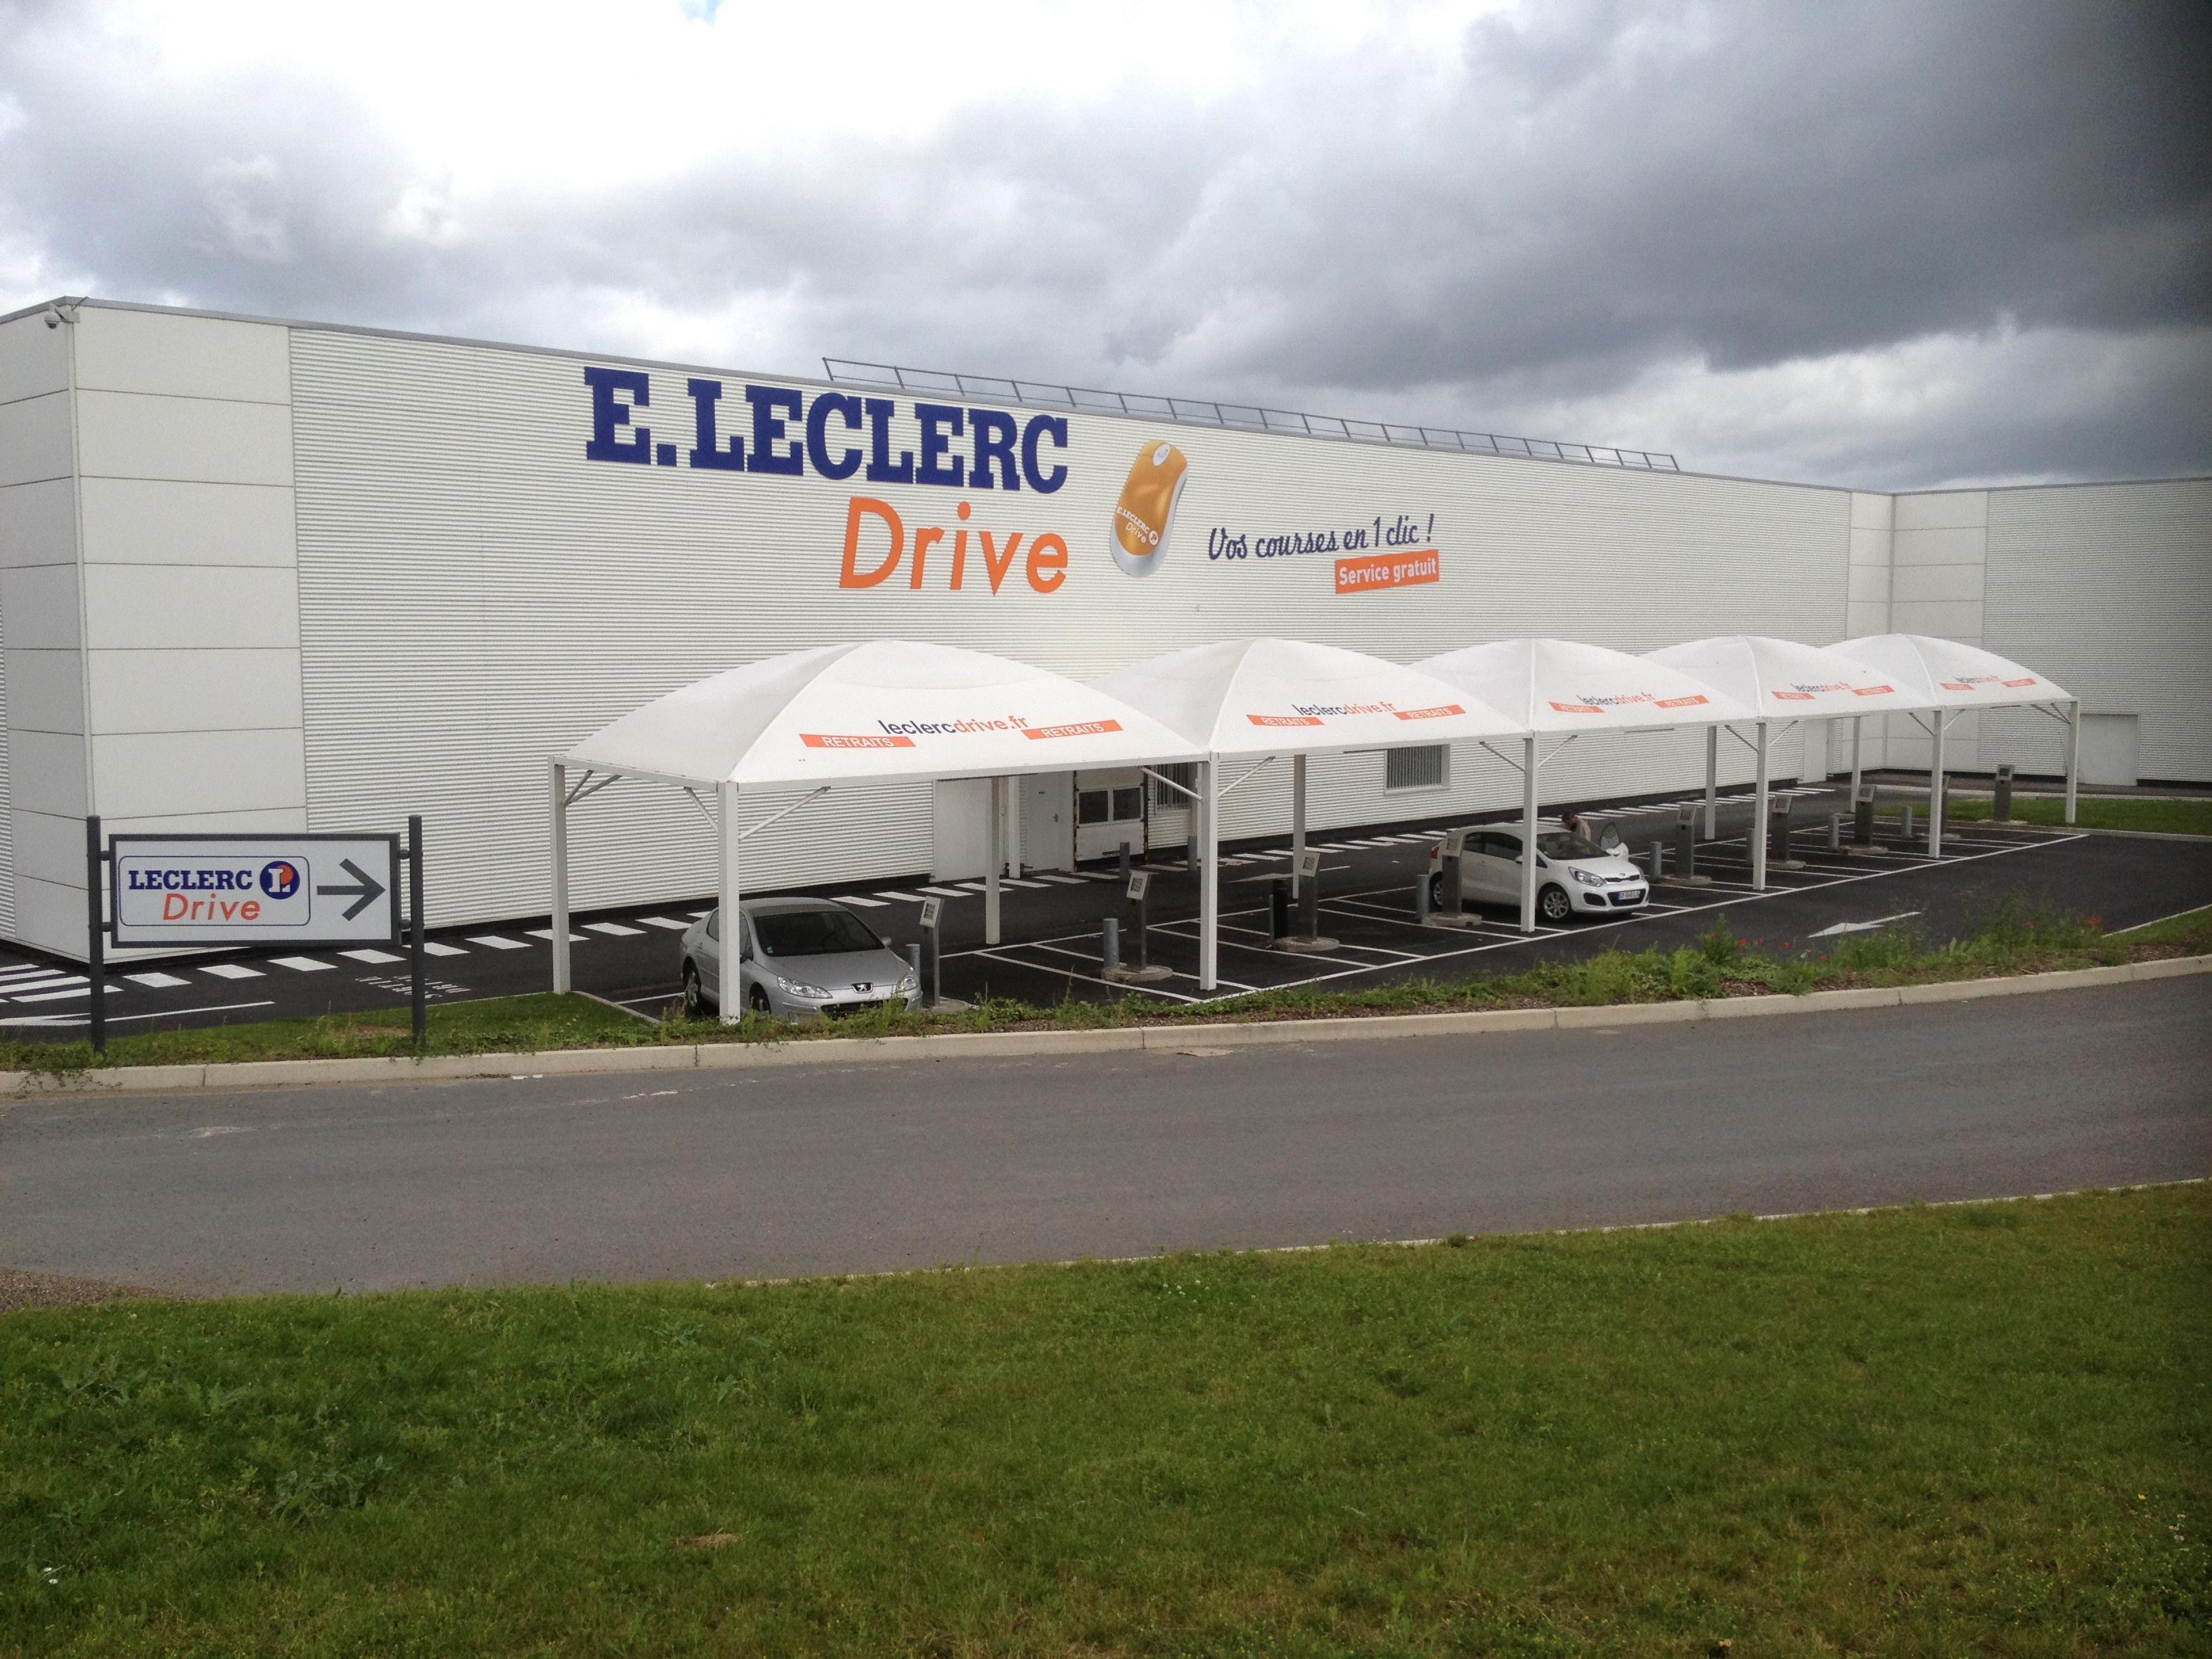 Abridrive pour E. leclerc drive